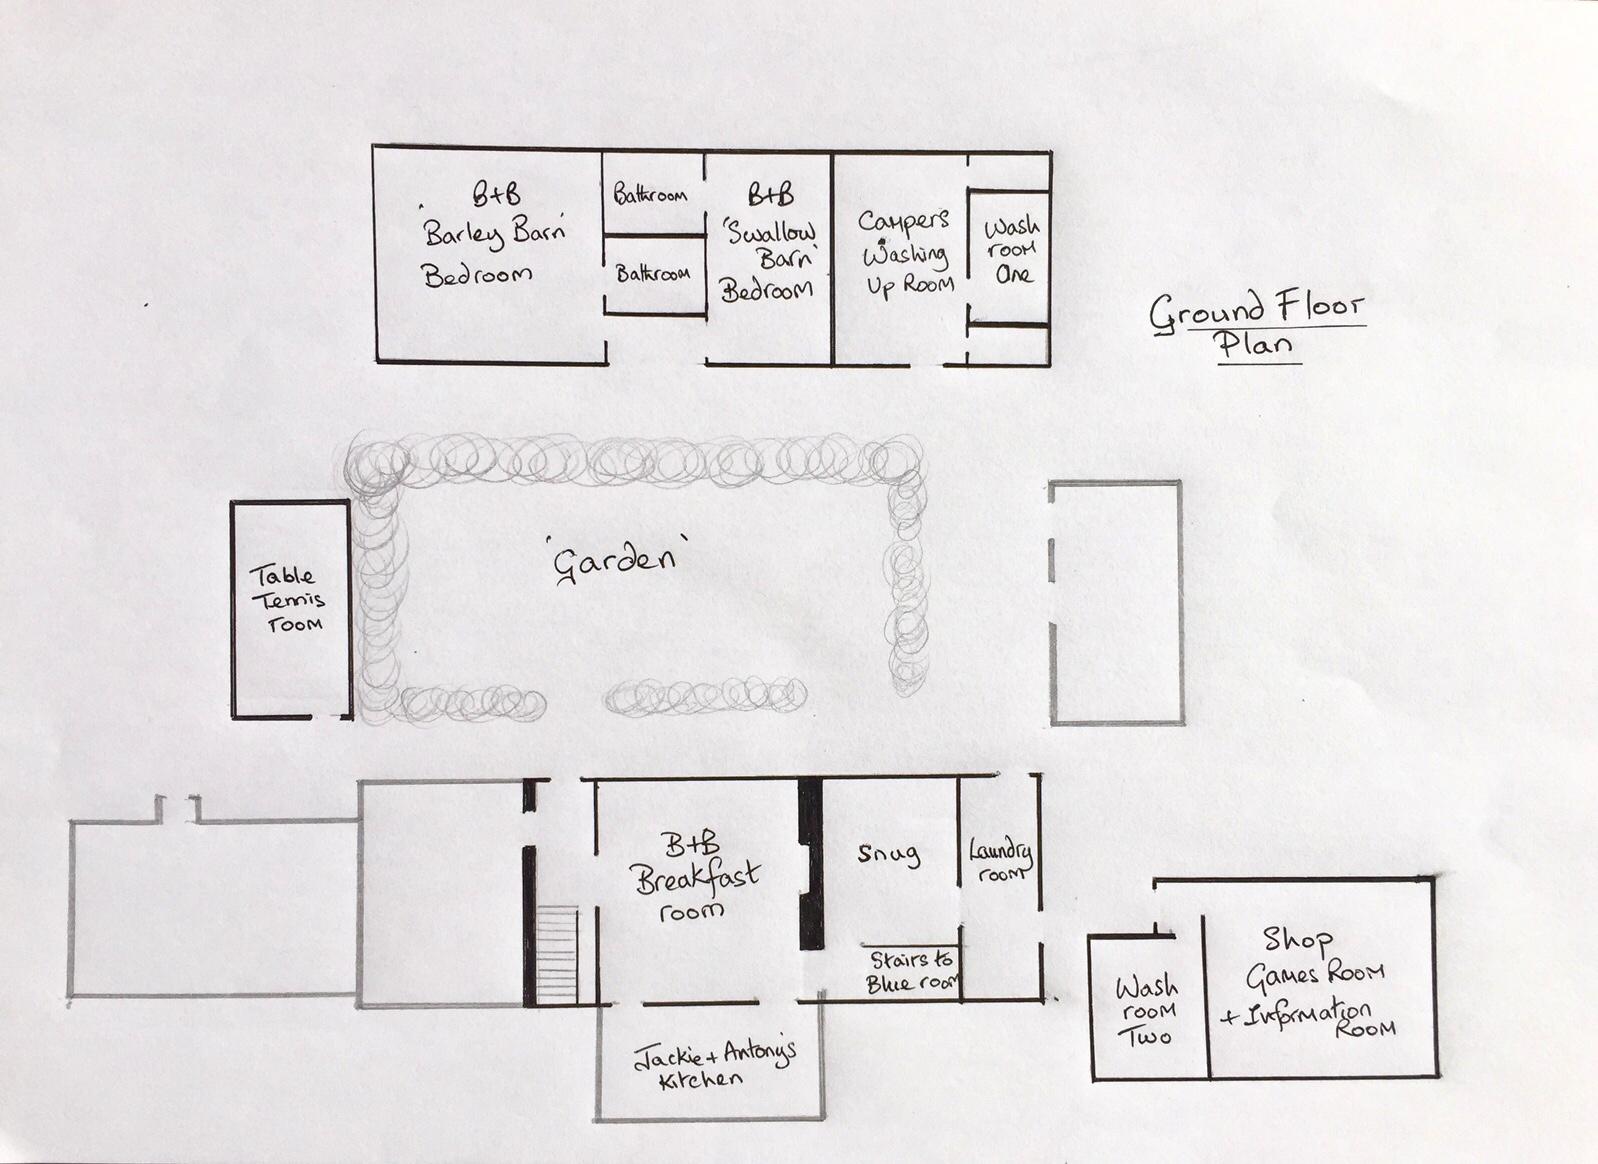 Ground floor room layout at Huxtable Farm B&B